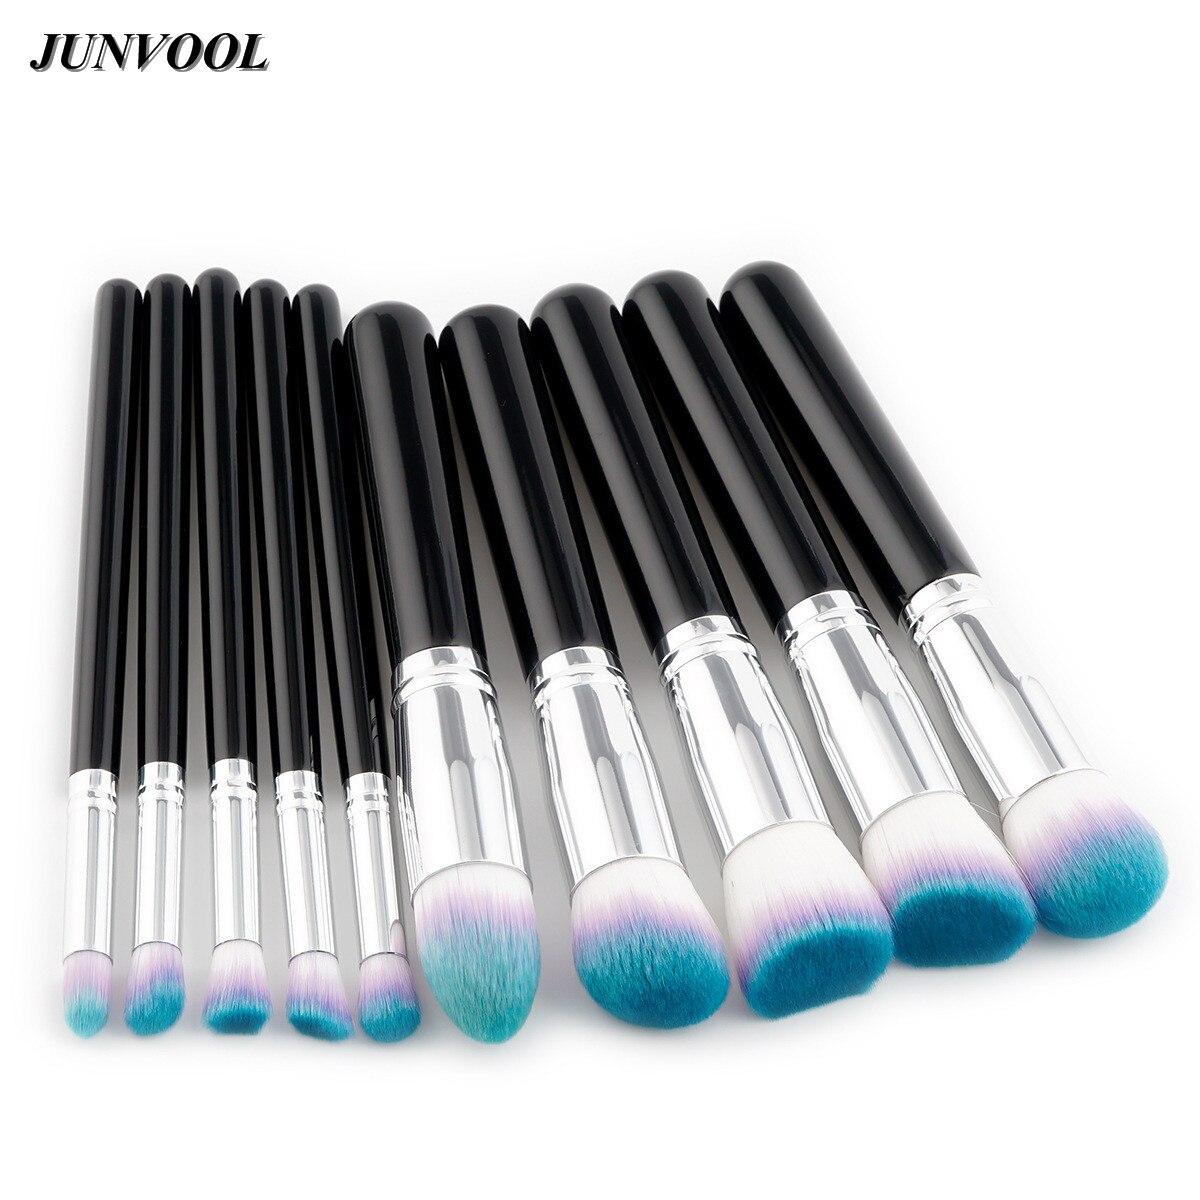 10 Pcs Blue Hair Makeup Brush Set Black Silver Cosmetics Foundation Blending Blush Makeup Tool Powder Eyeshadow Cosmetic Set bob cosmetic makeup powder w puff mirror ivory white 02